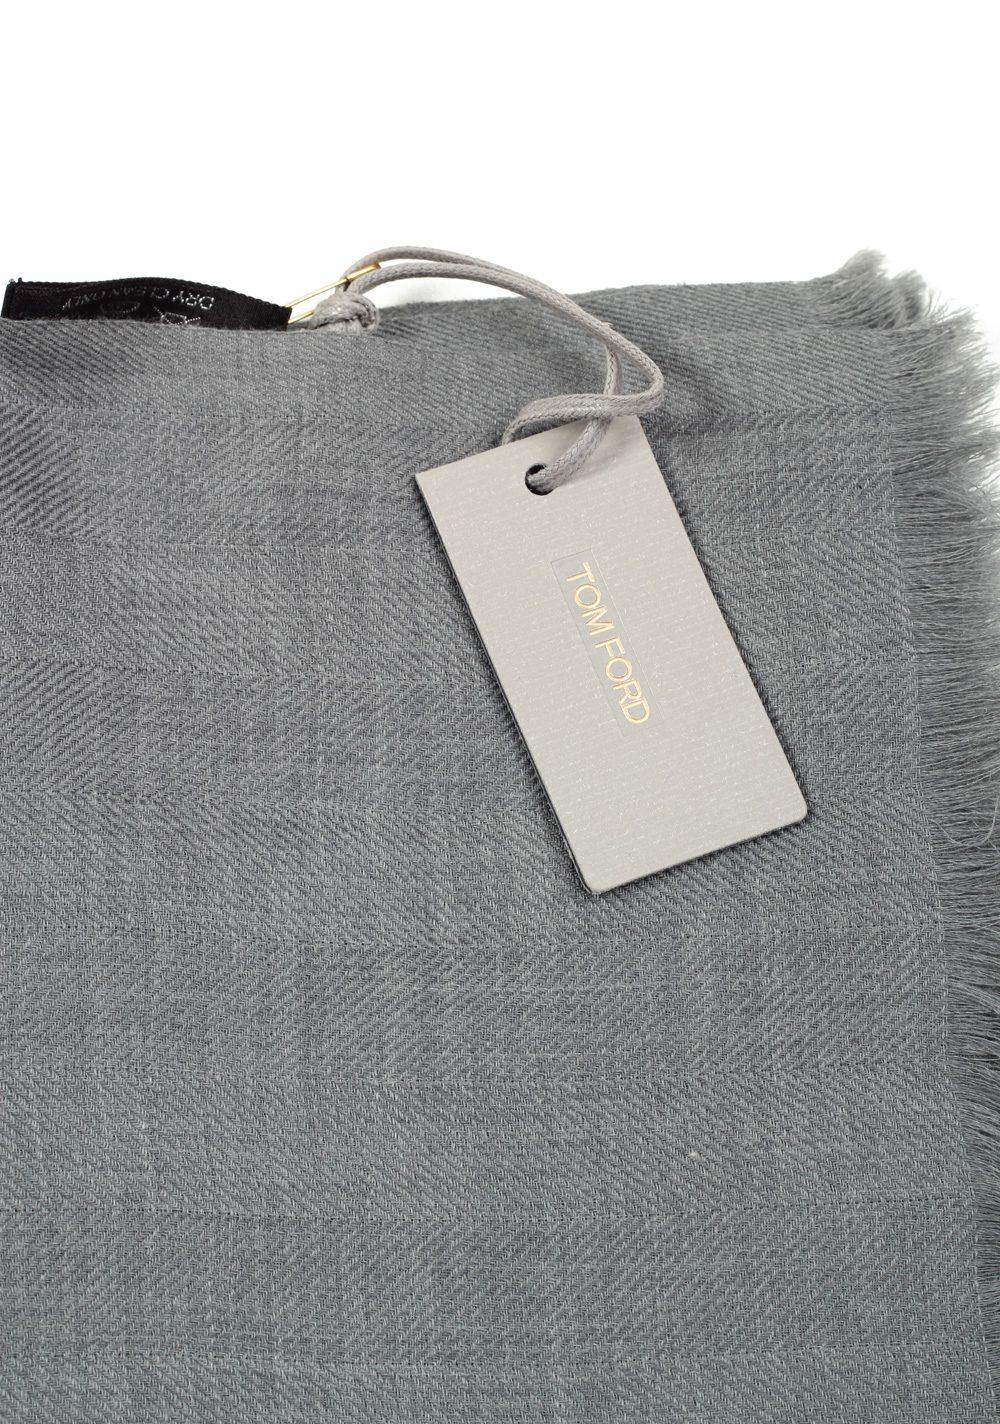 Tom Ford Gray Cashmere Cotton Signature Scarf 75″ / 24″ | Costume Limité